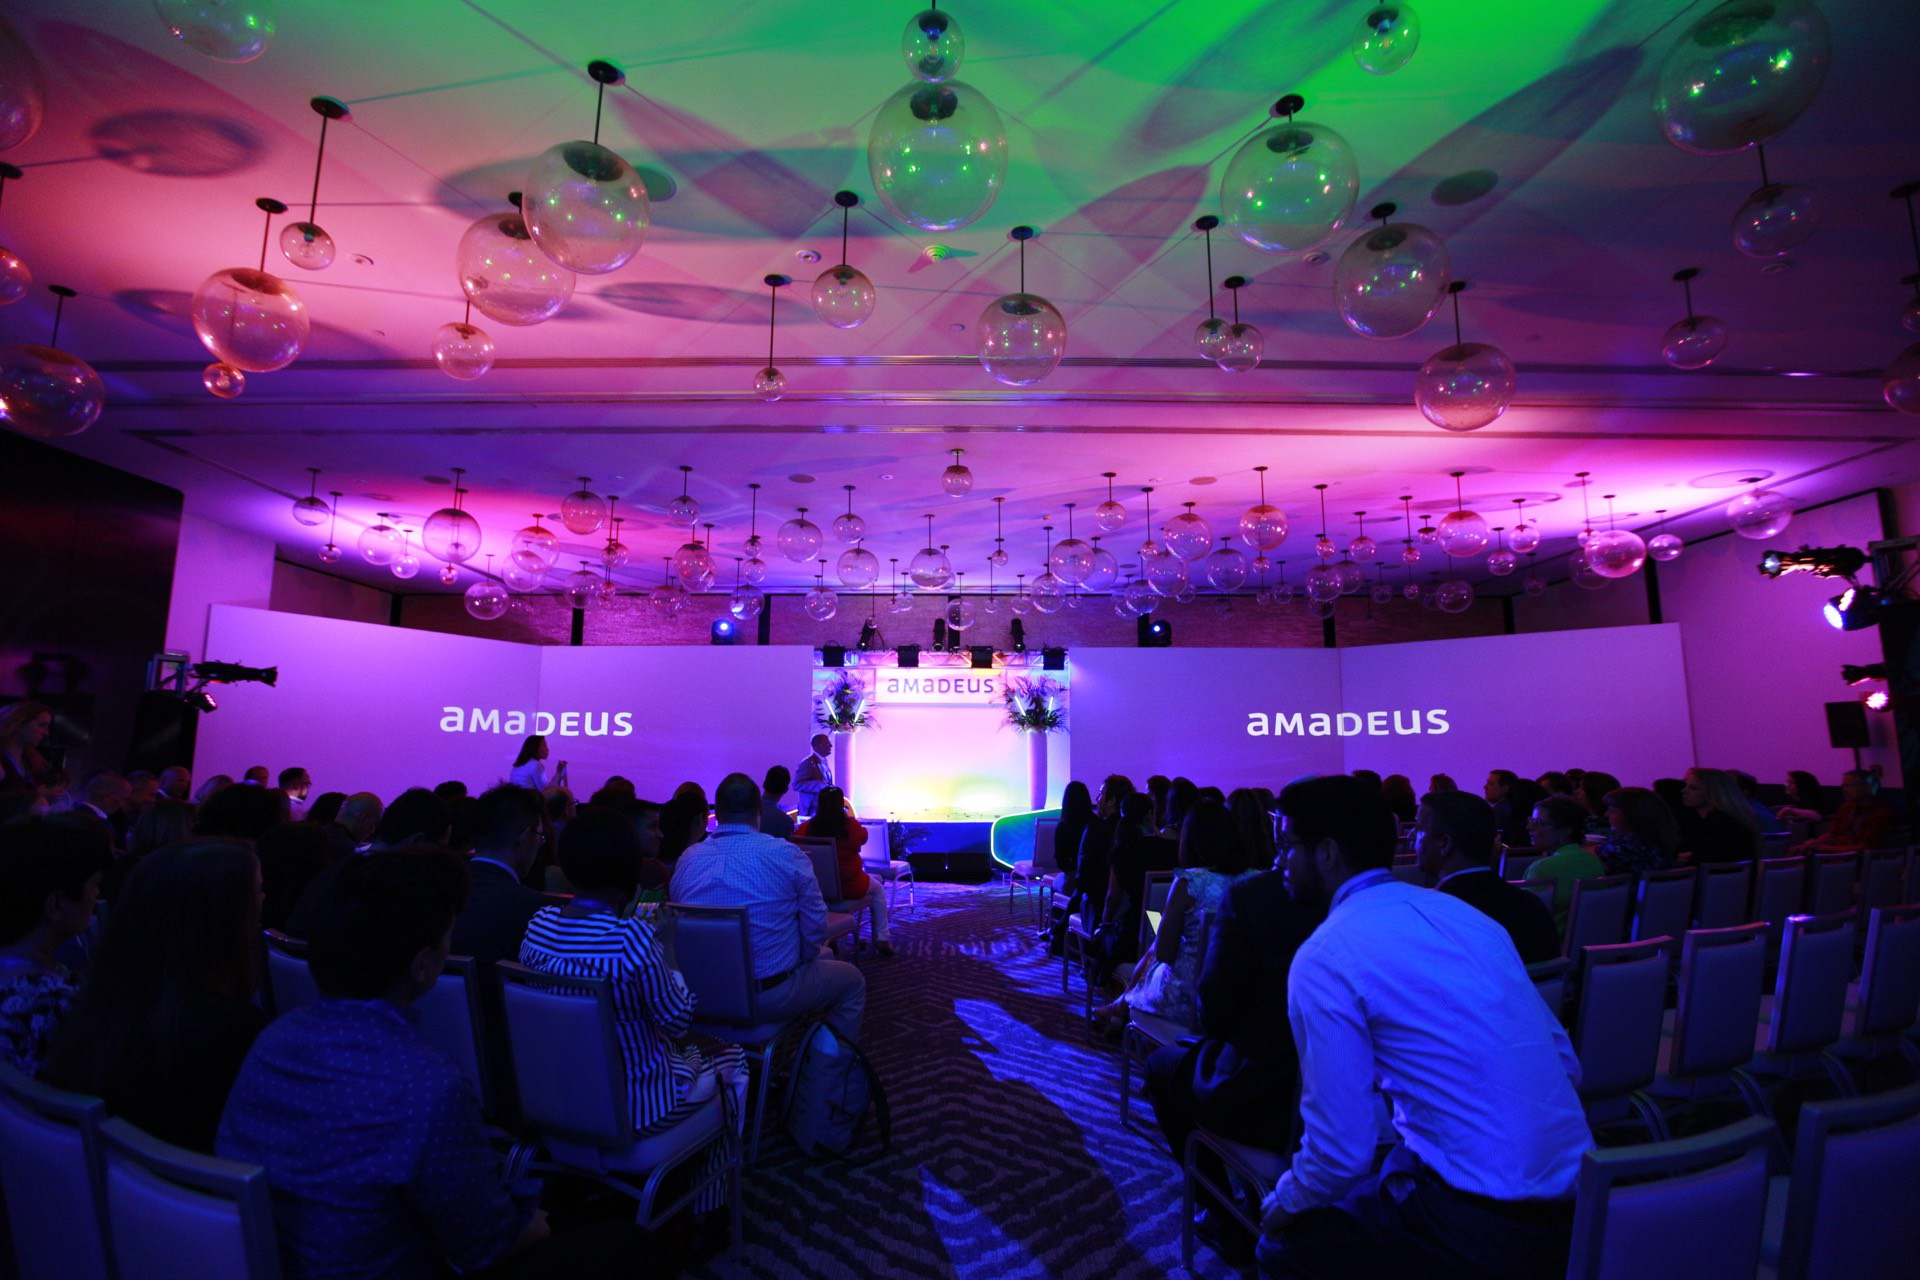 Amadeus_Miami_Florida_Brian_Adams_Malloy_Events_Corporate_Production_stage_lighting